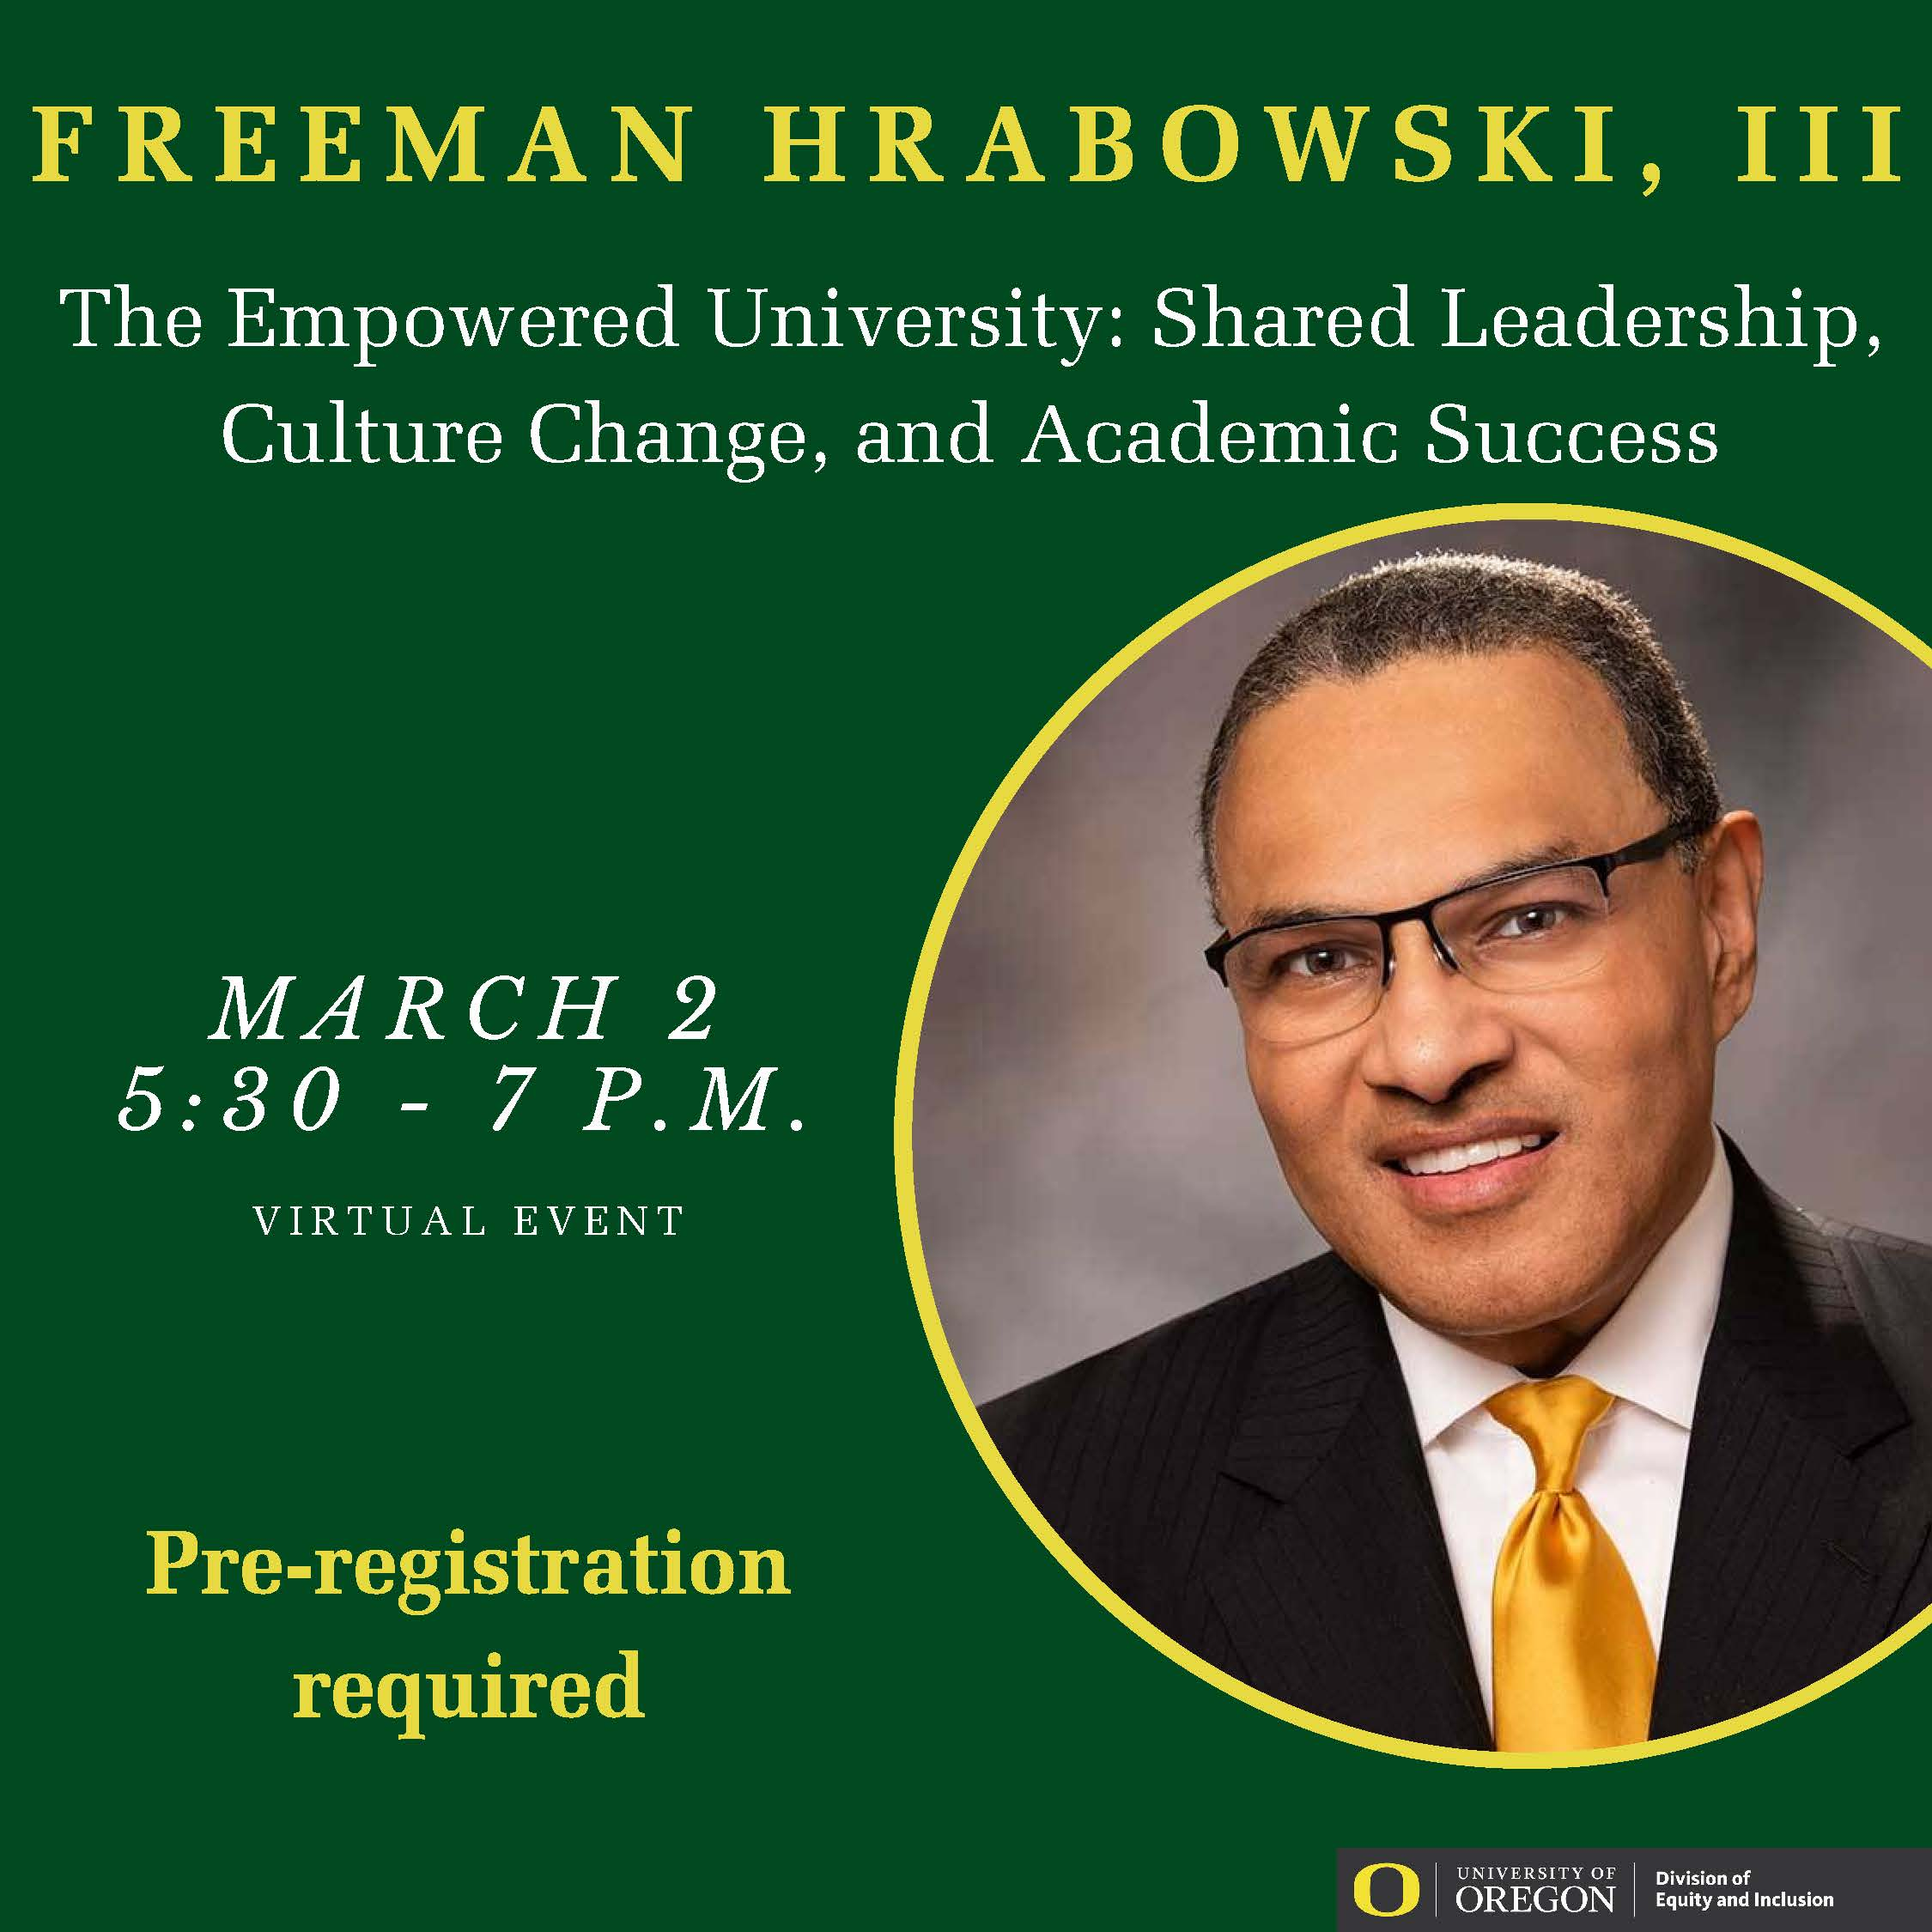 freeman a. hrabowski iii.